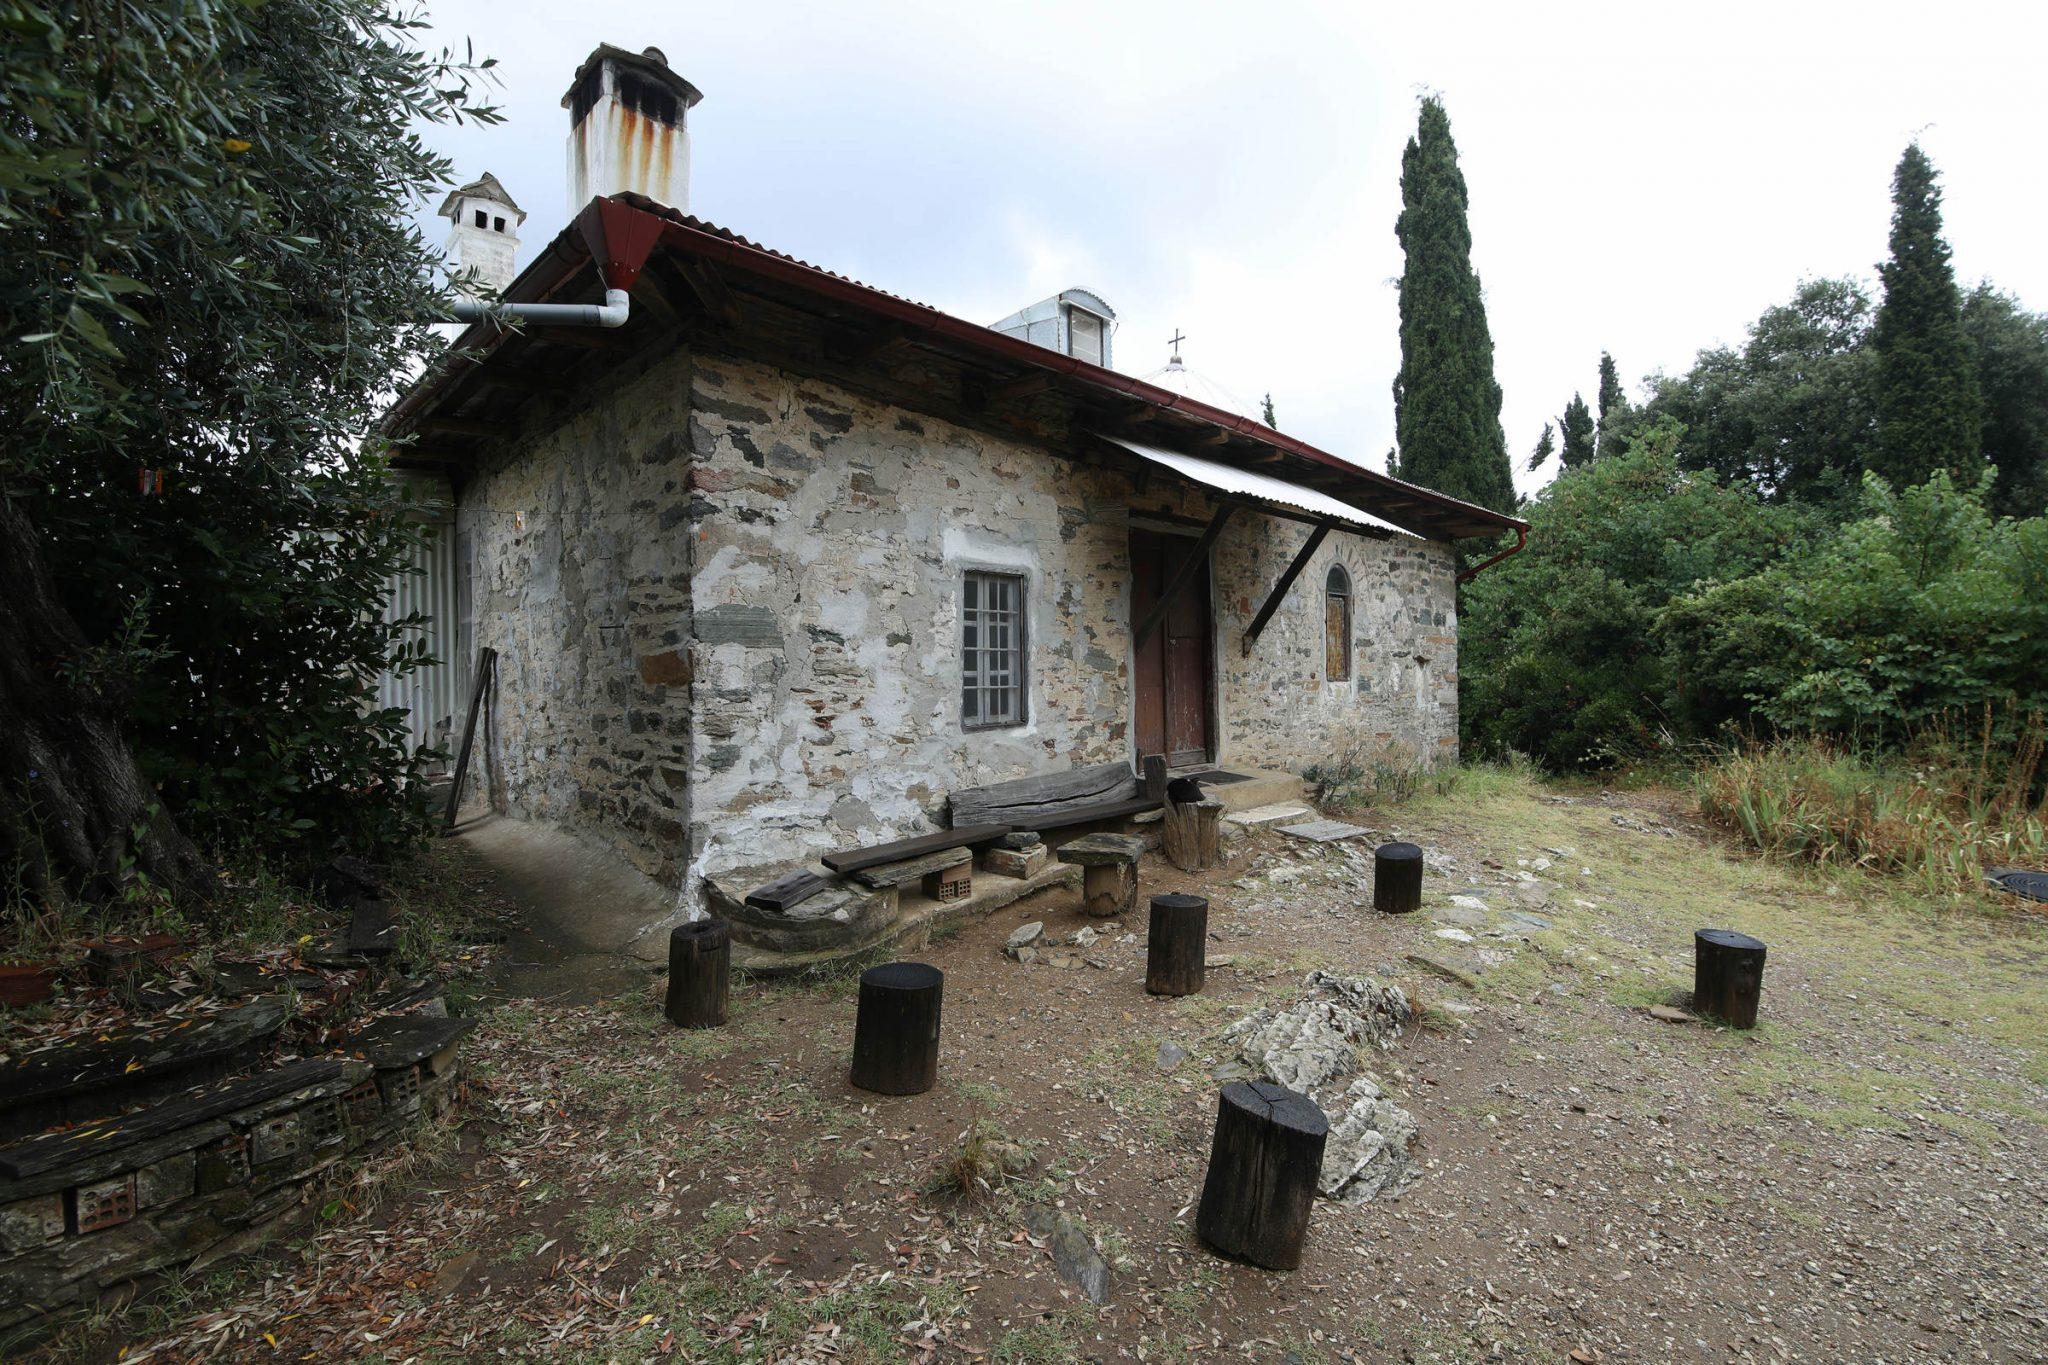 Paisios of Mount Athos' cell - archontariki, front view